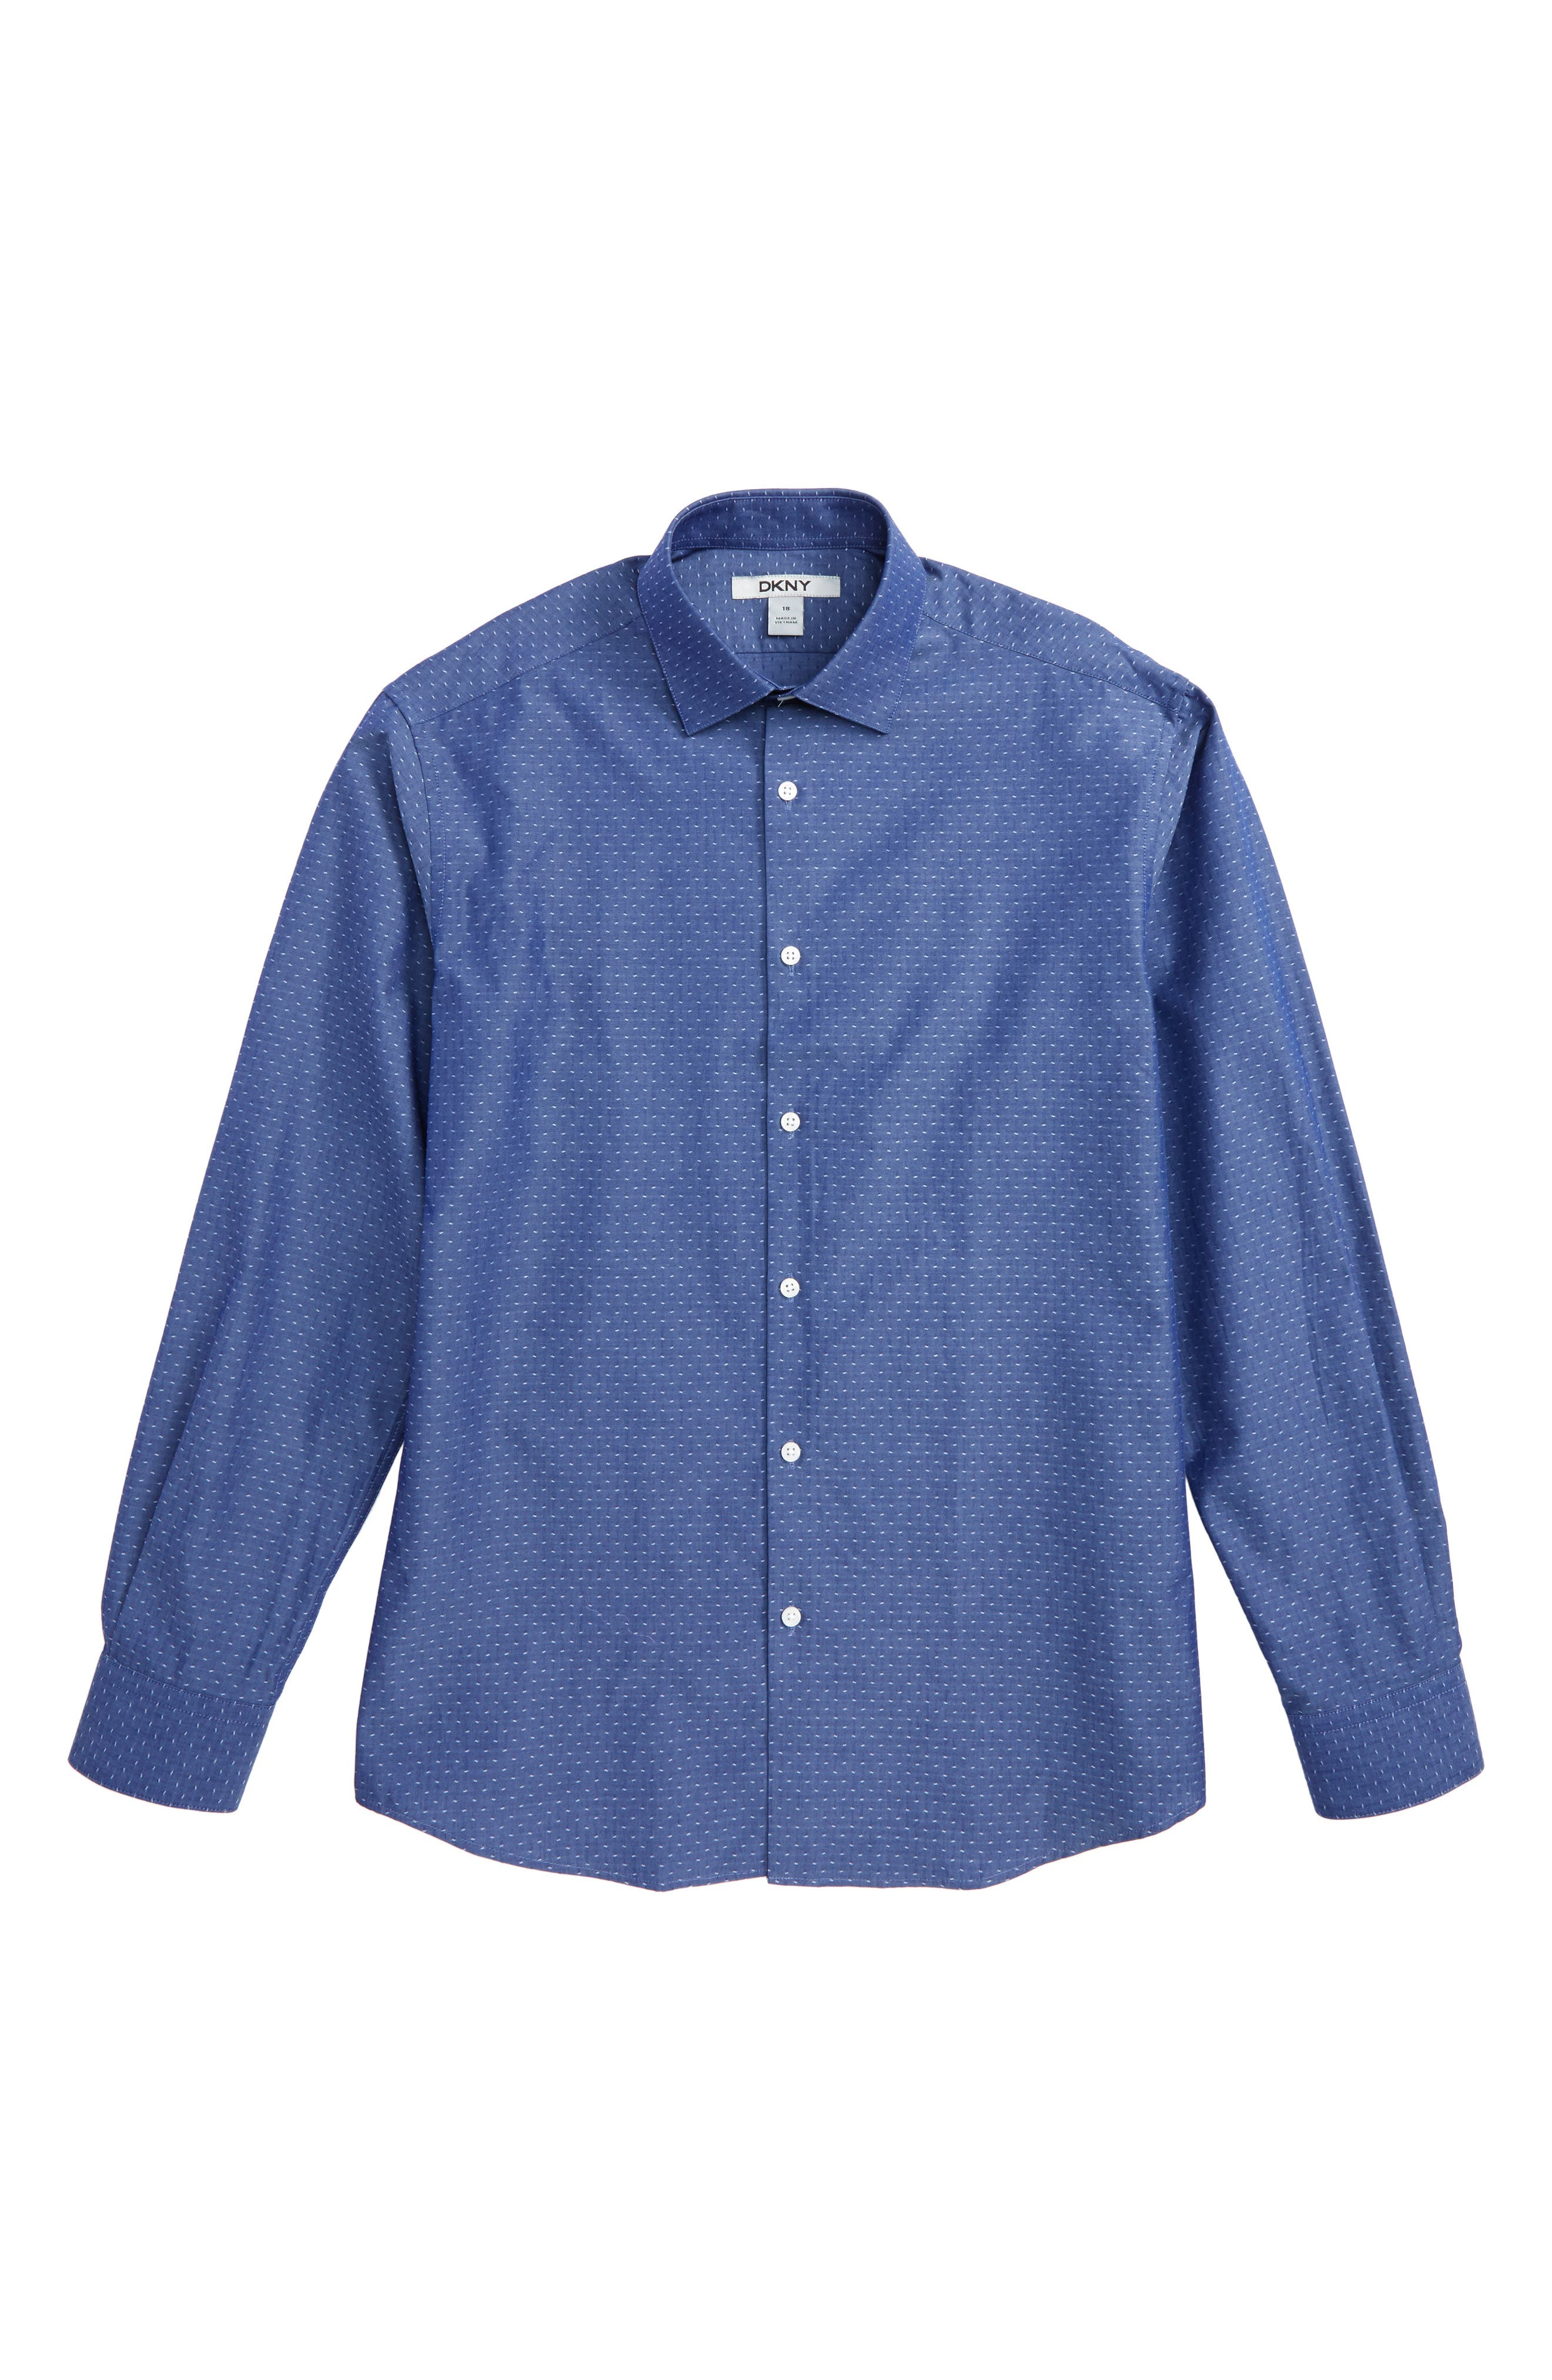 Dobby Dress Shirt,                         Main,                         color, Blue